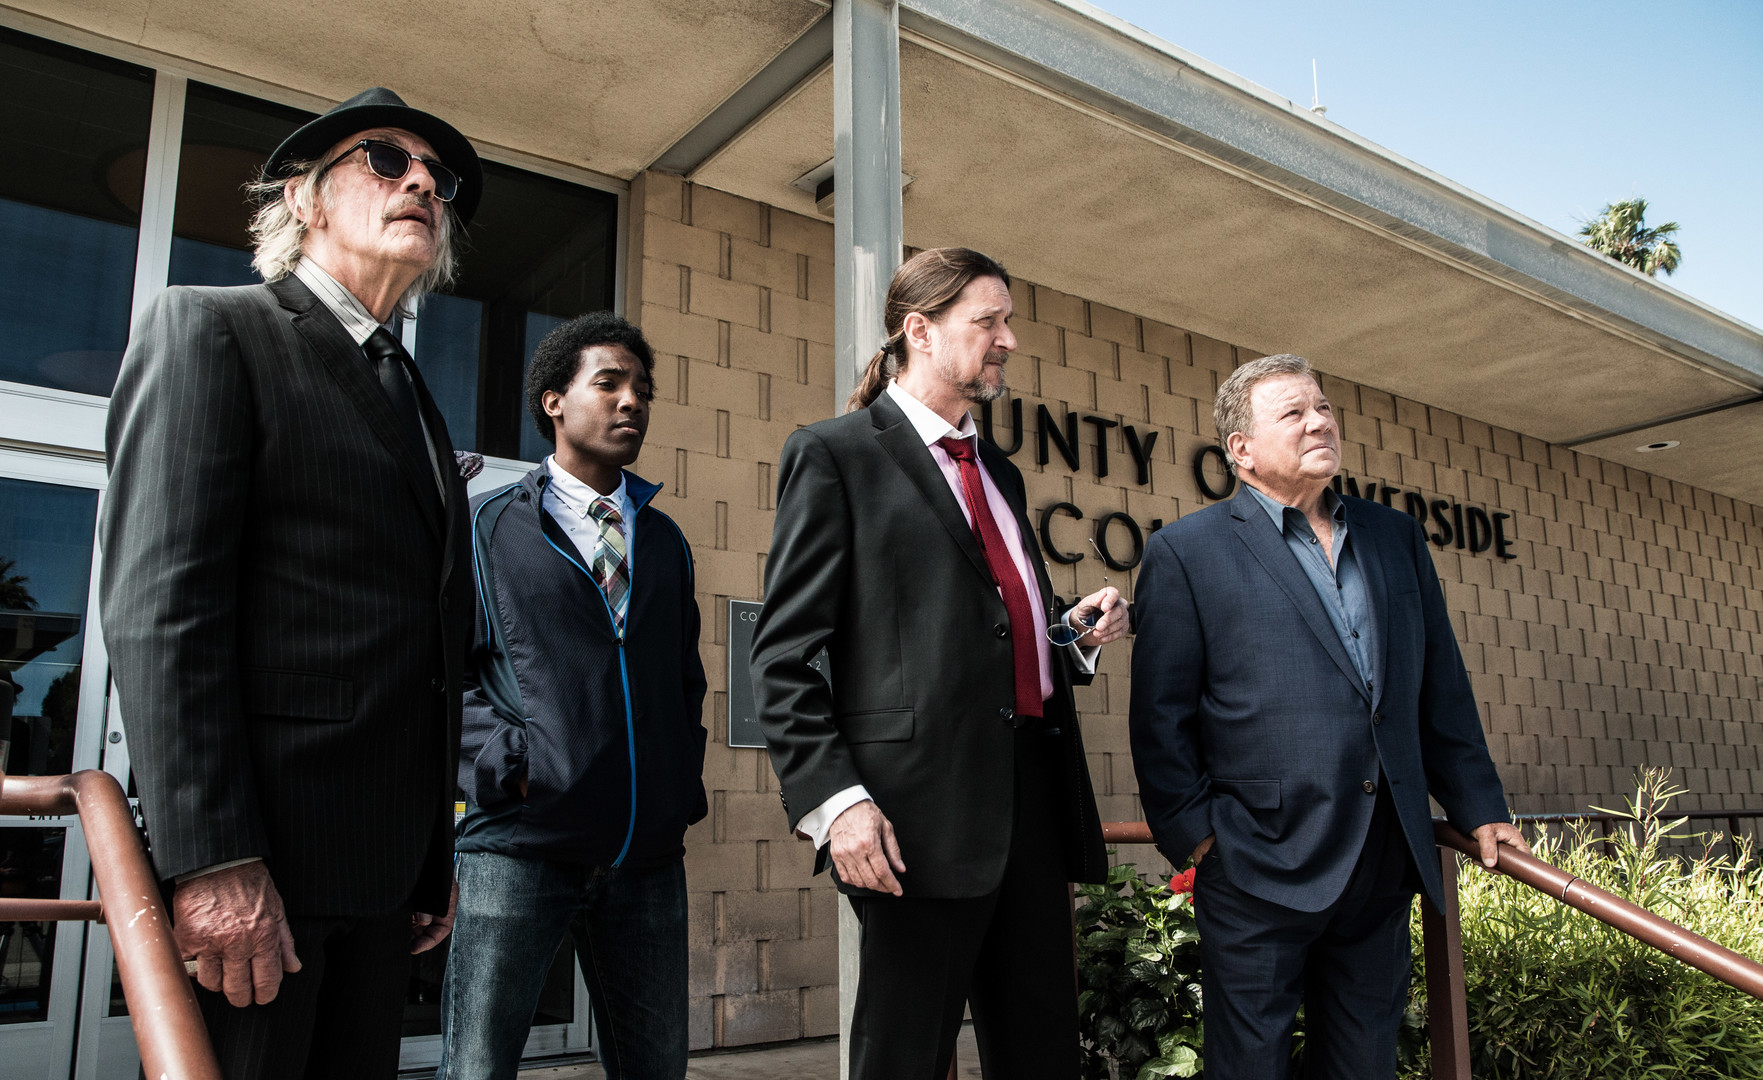 Christopher Lloyd, William Shatner, Don McManus, and Kal Smith in Senior Moment (2021)